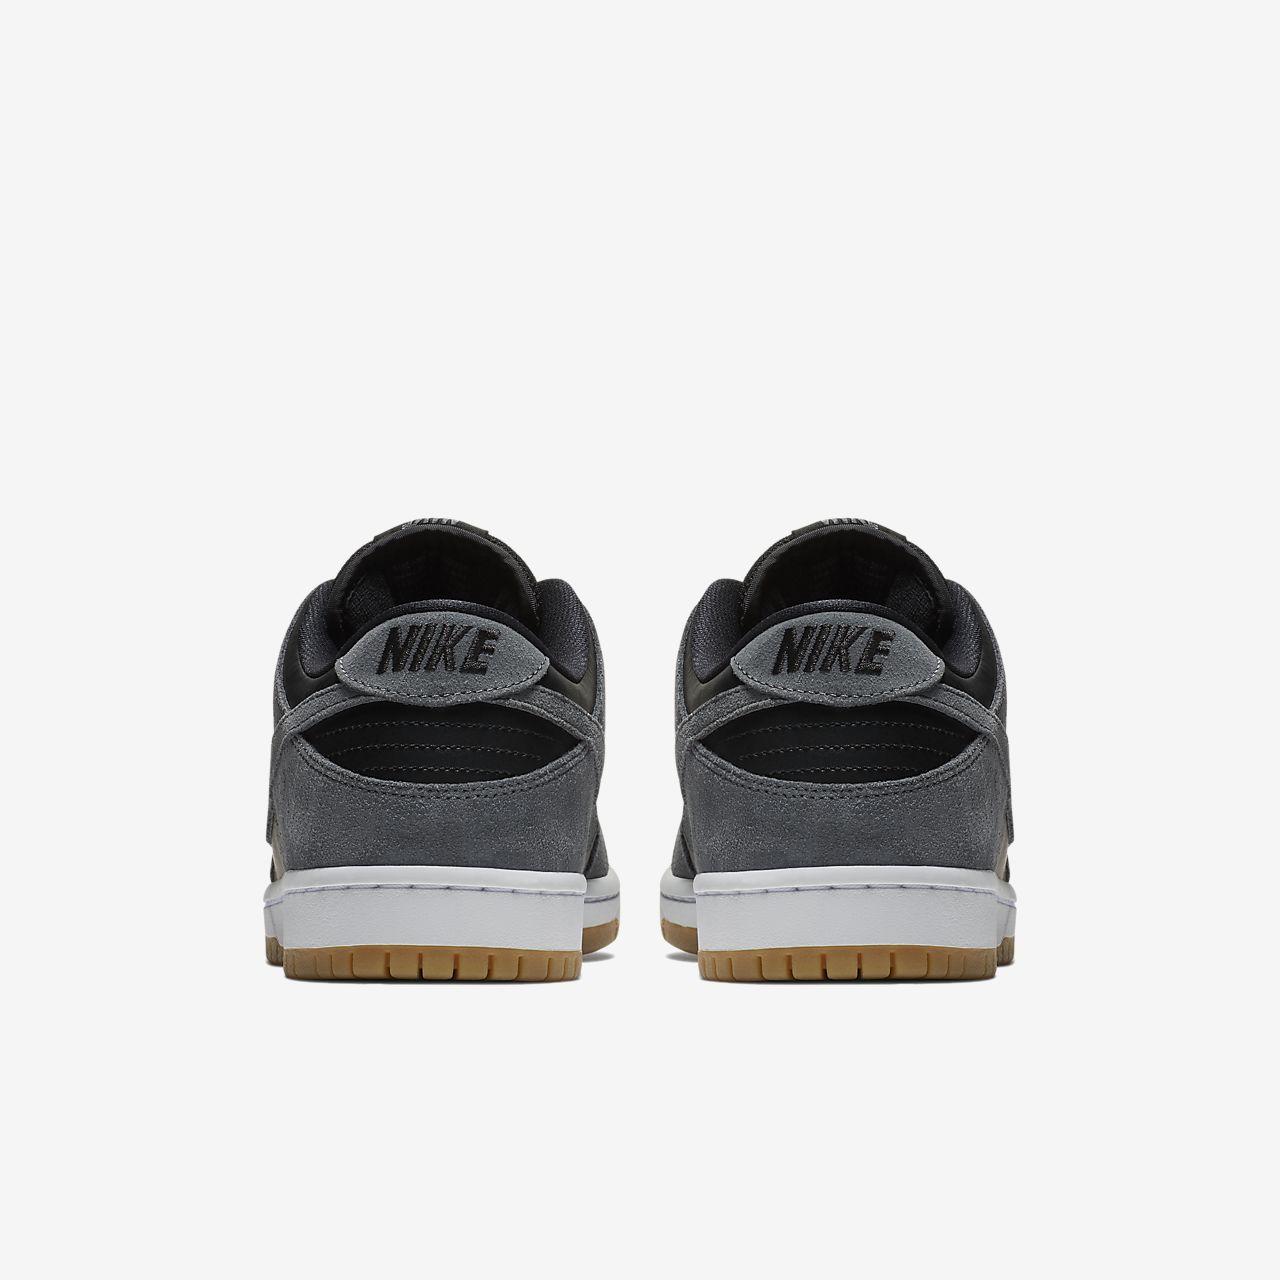 san francisco 3814d a888e Chaussure de skateboard Nike SB Dunk Low TRD pour Homme. Nike.com CA